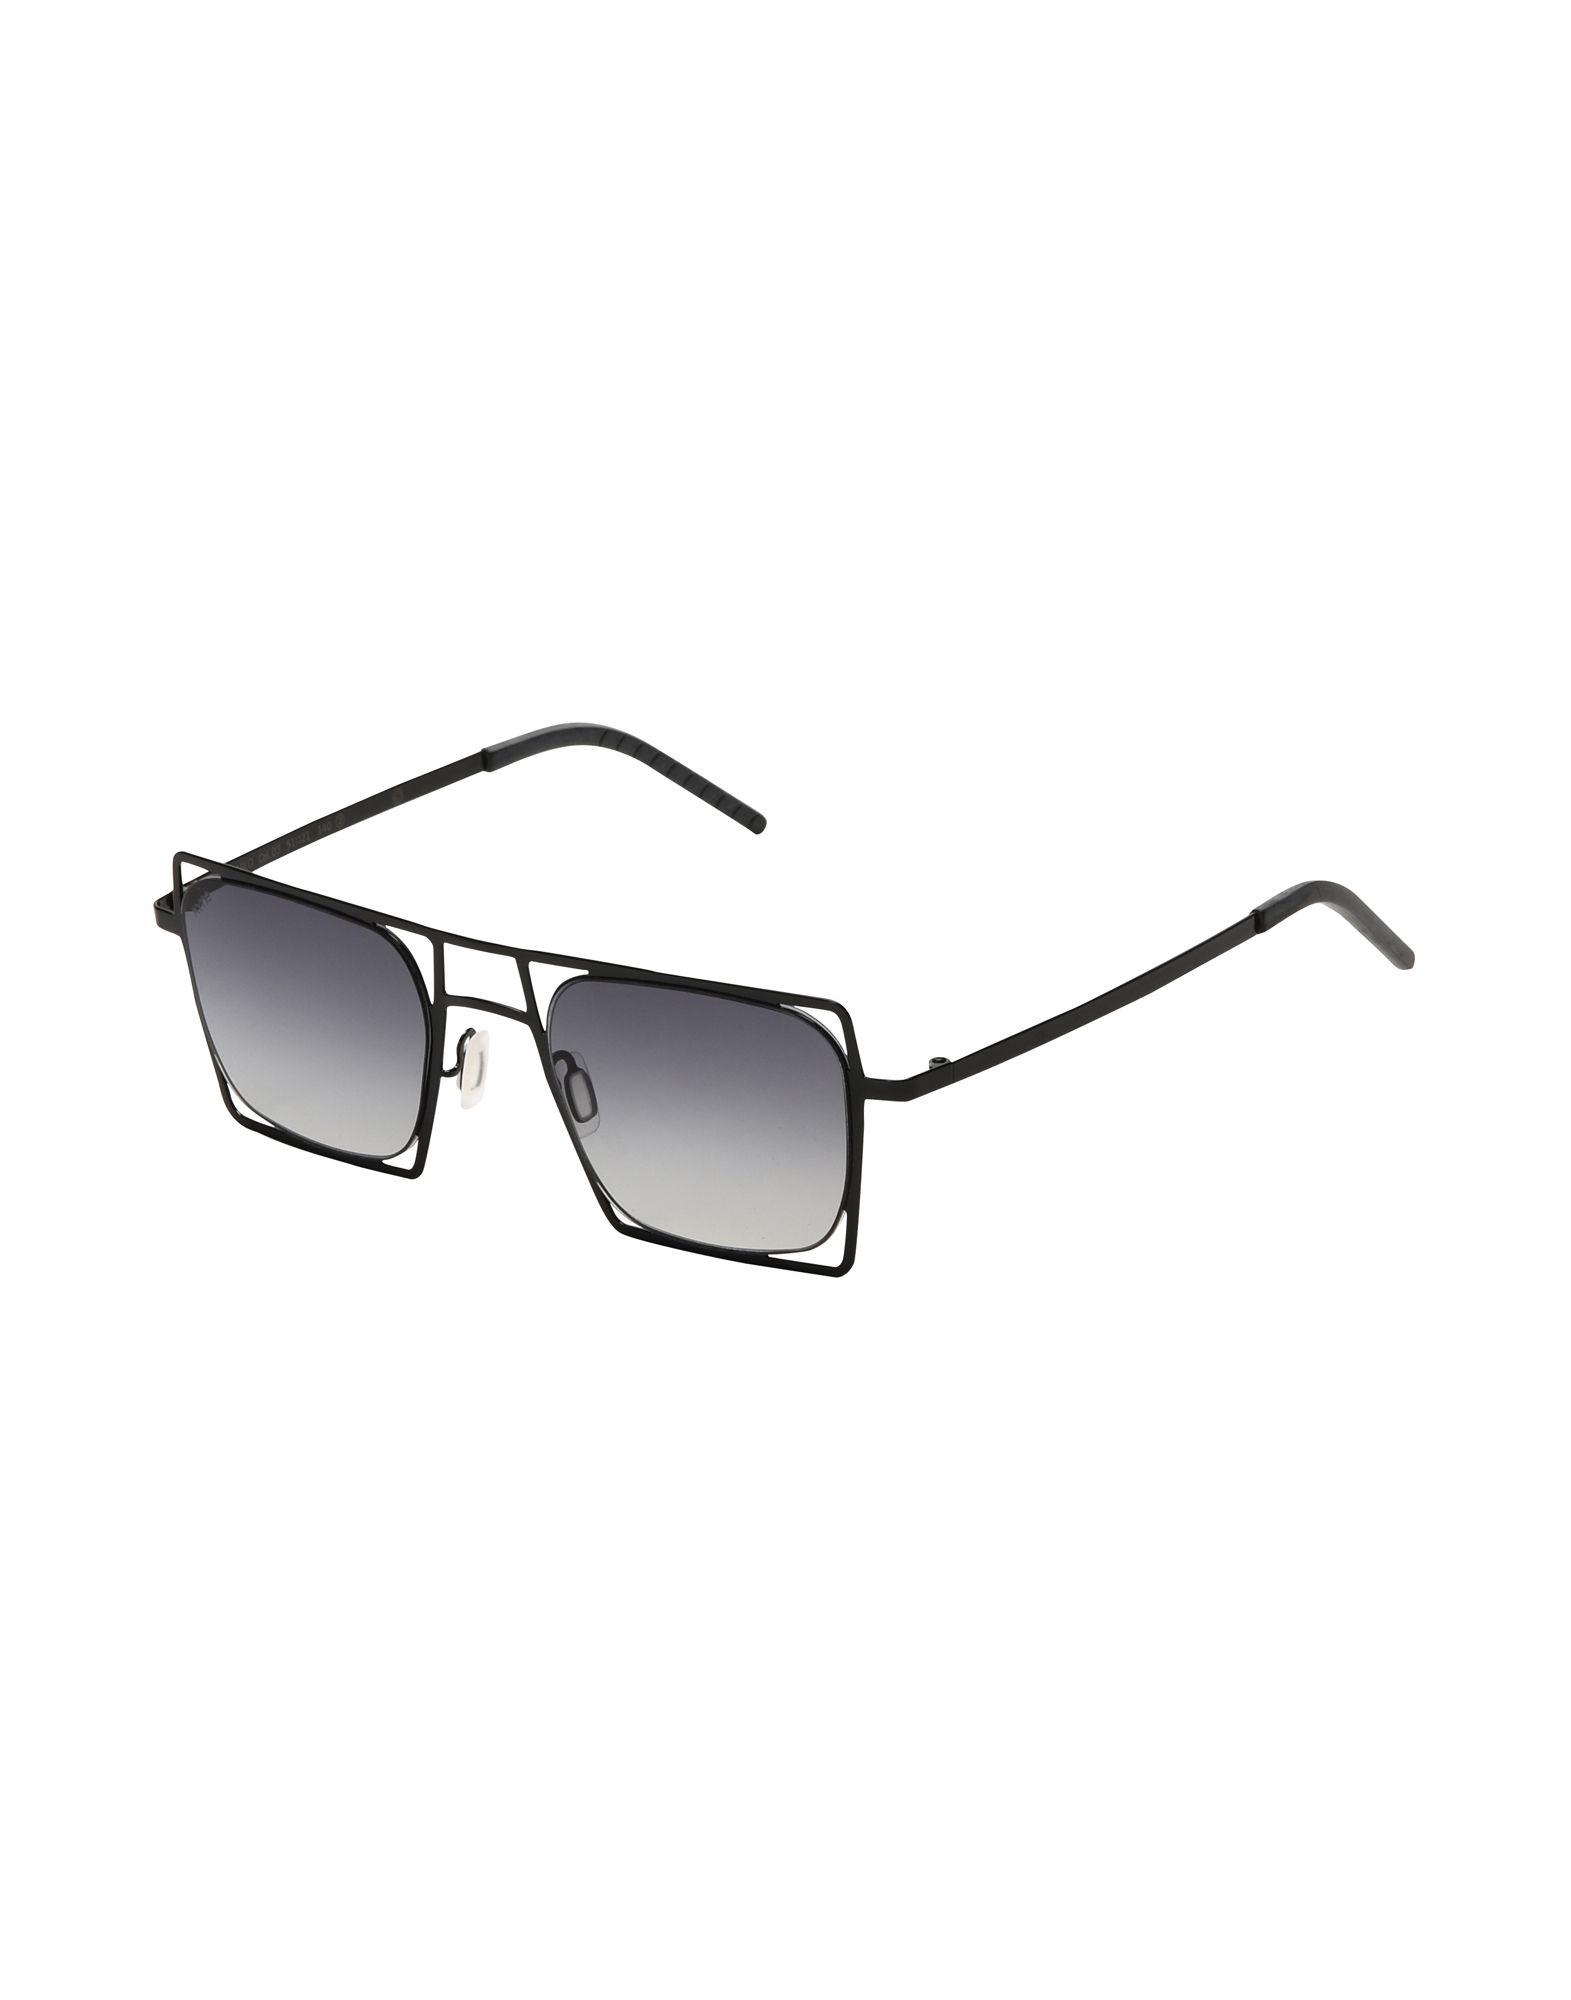 Фото - KYME Солнечные очки 3d очки